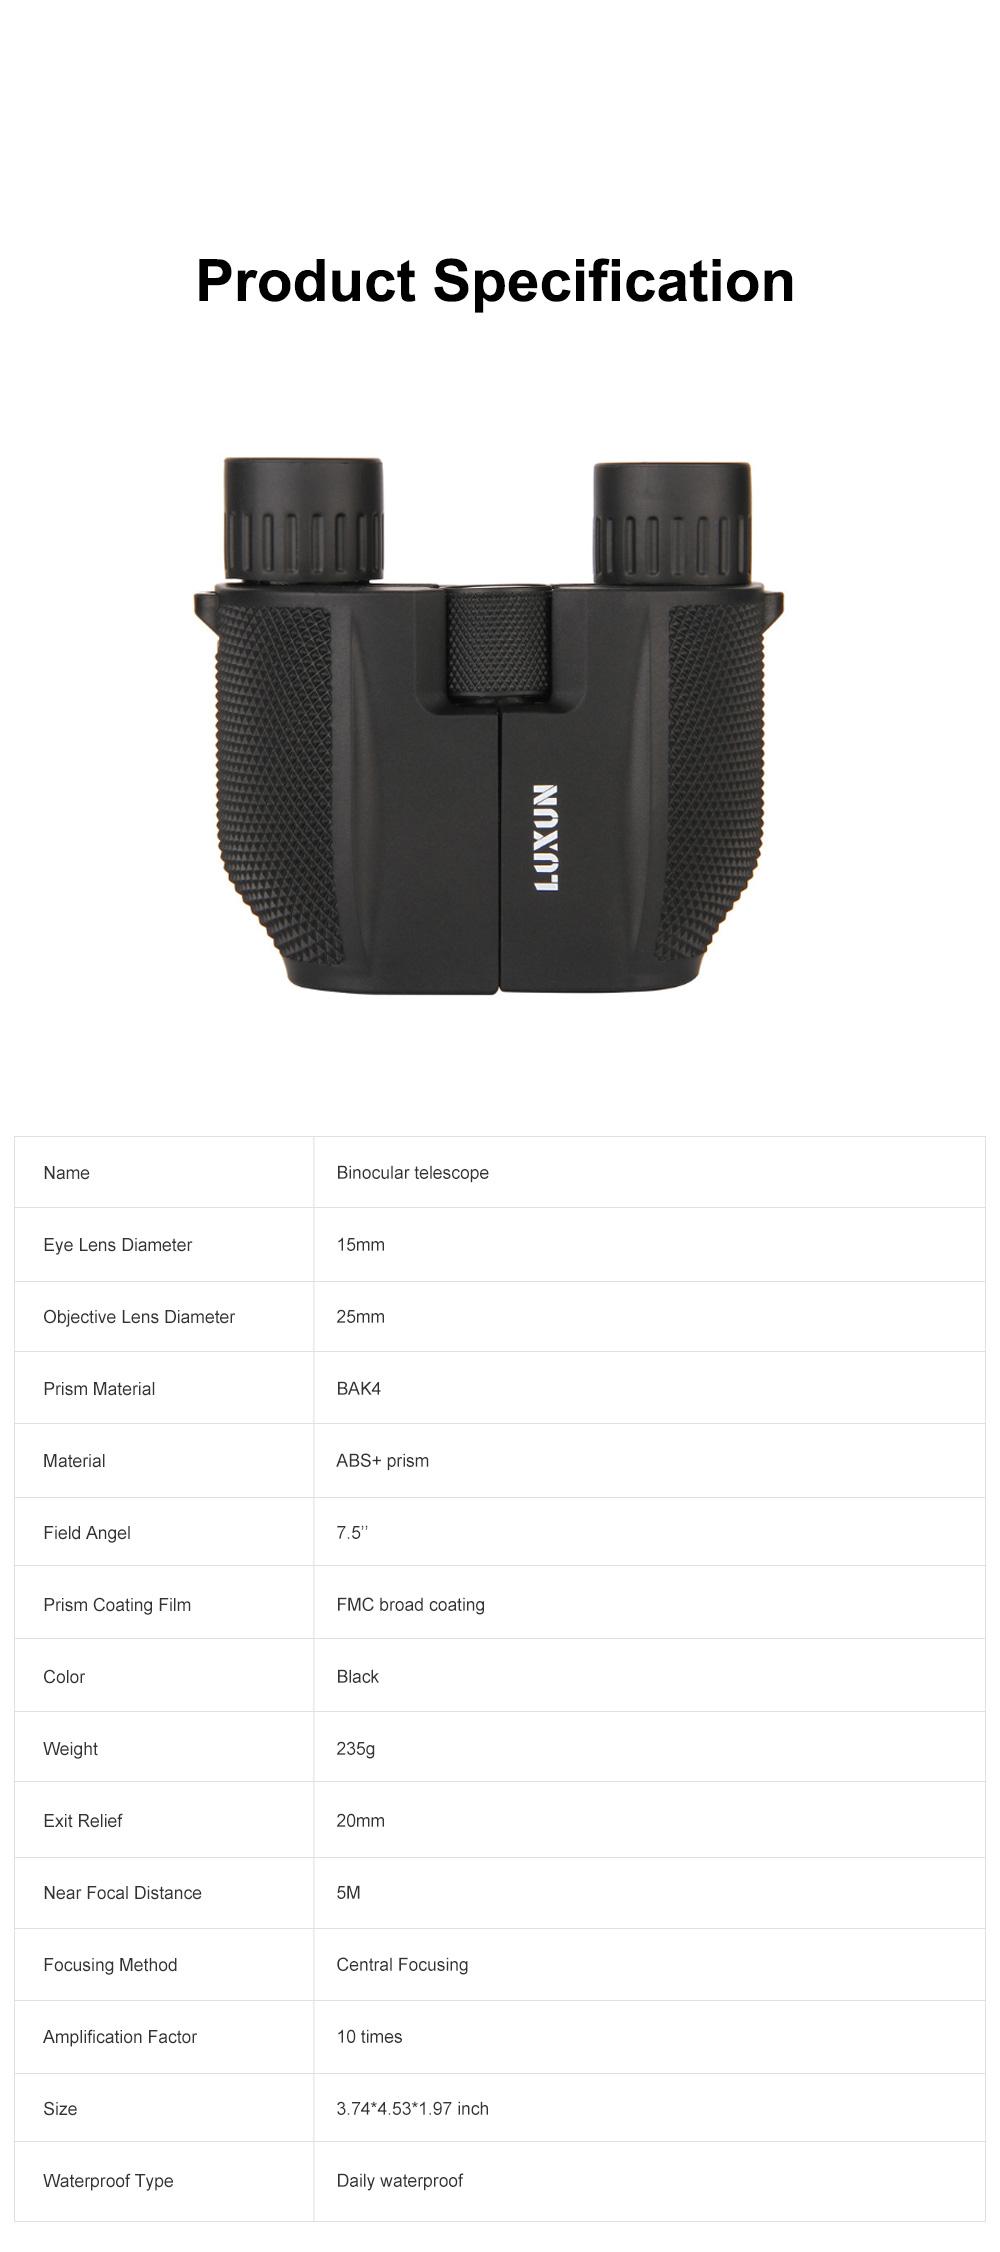 Portable Handy Waterproof High-powered High Definition Telescope Binoculars Pancratic Lens Adjustable Focus 6